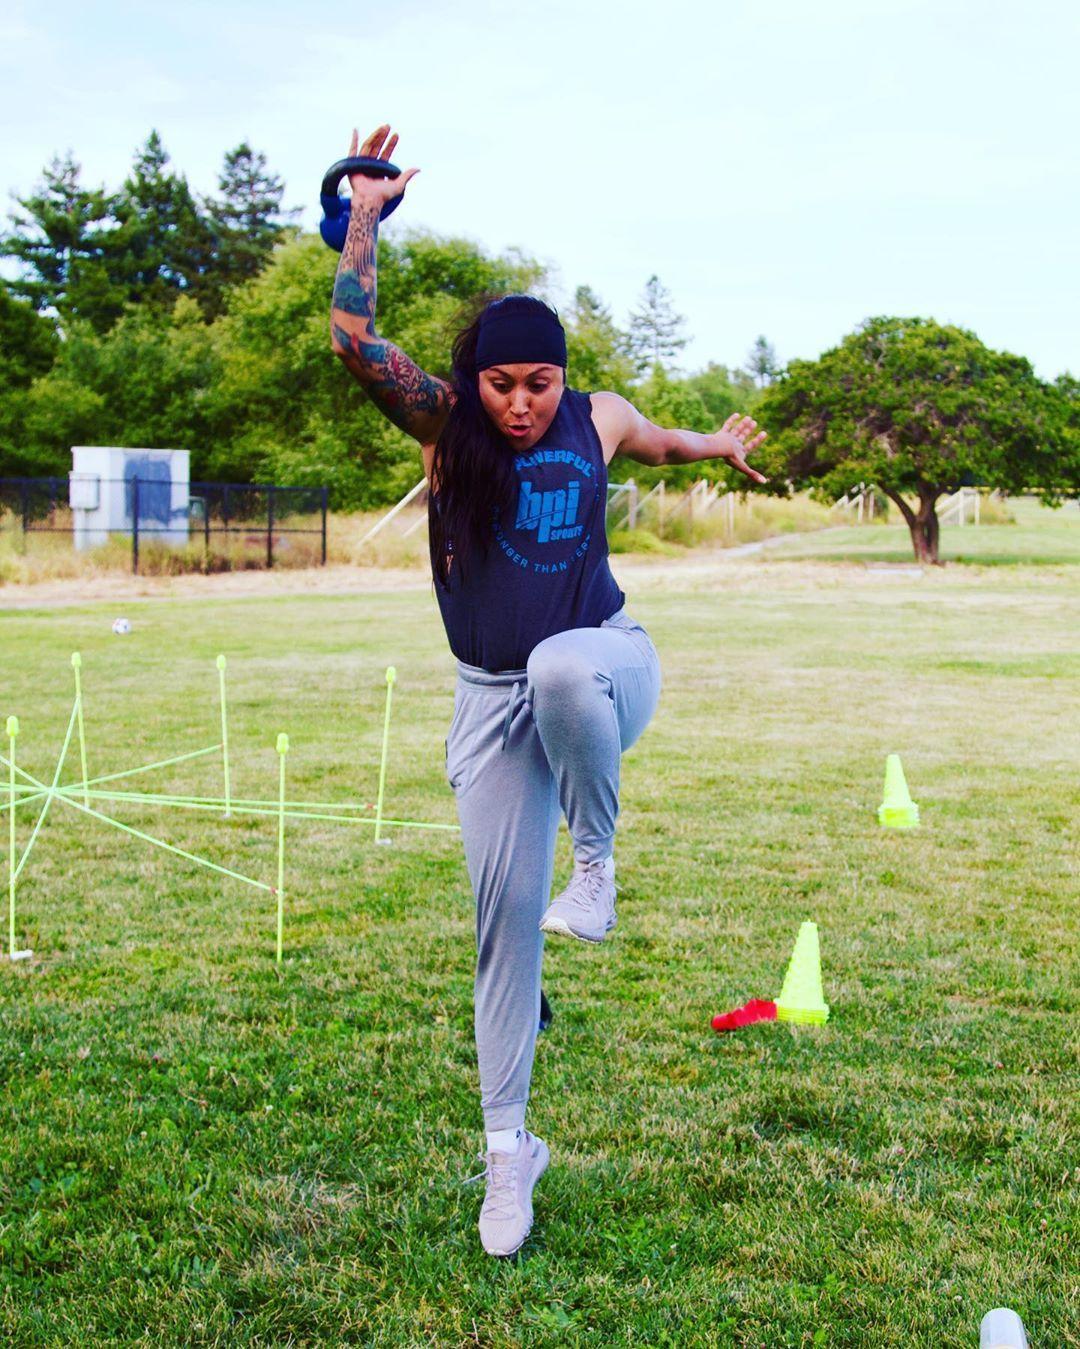 Power up #kettlebellworkout #kettlebell #runner #marathontraining #speed #mastertrainer #gains #fitn...